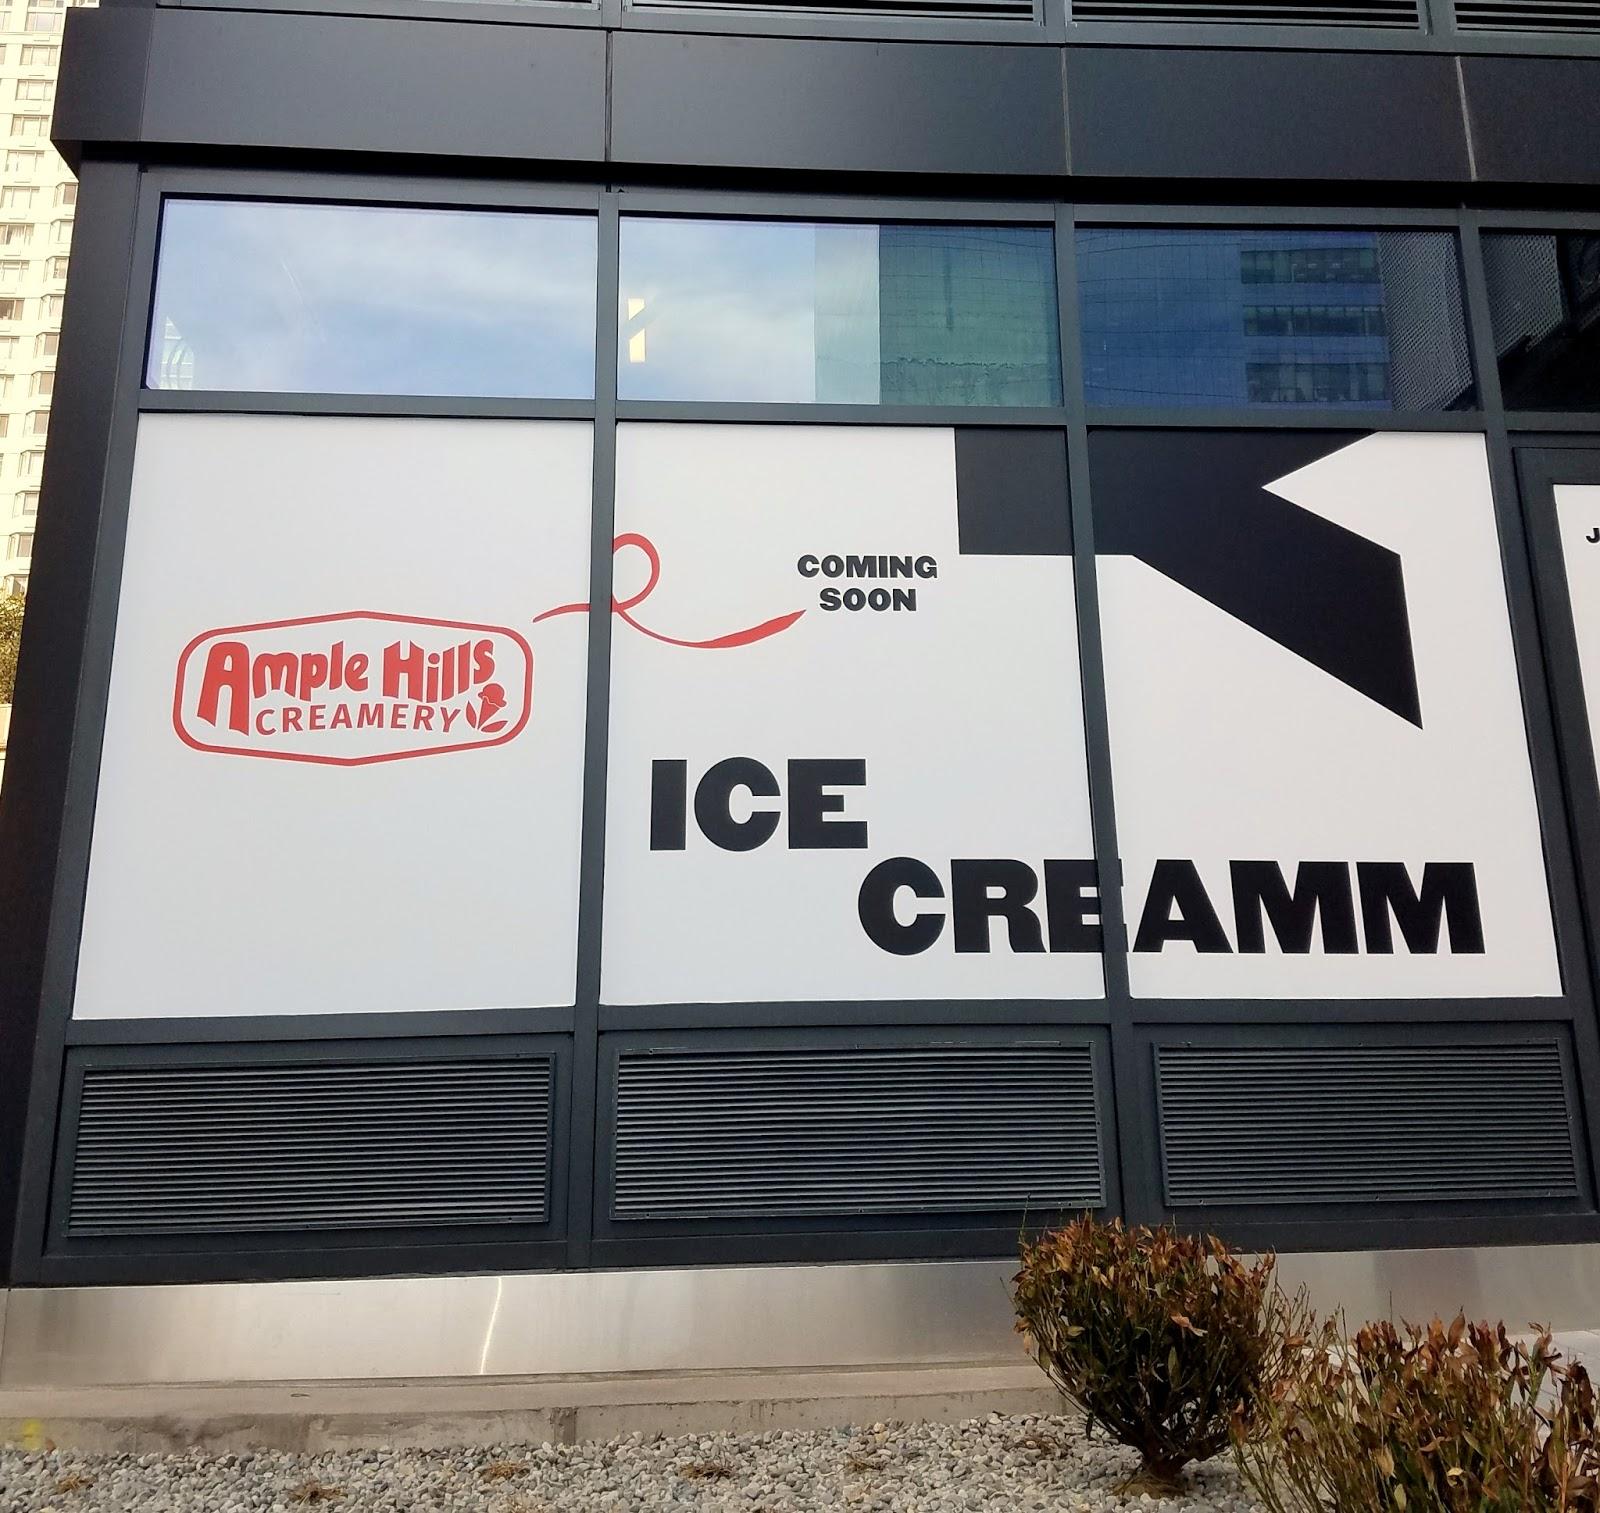 jersey city eats: construction update: ani ramen announces opening